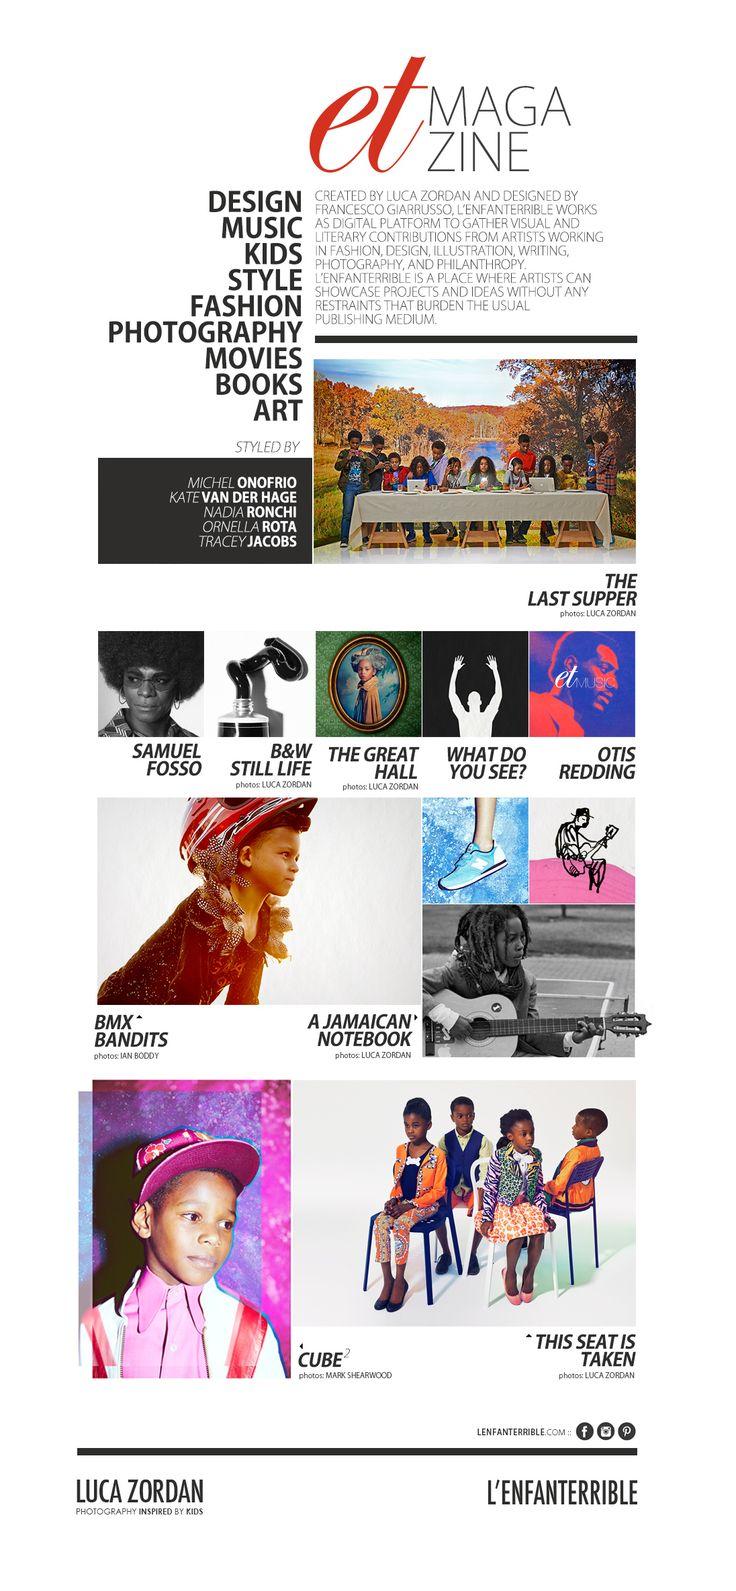 #L'Enfanterrible magazine #lucazordan #magazine #fashion #digitalmagazine #design #graphicdesign #style #kidsfashion #childrenfashion